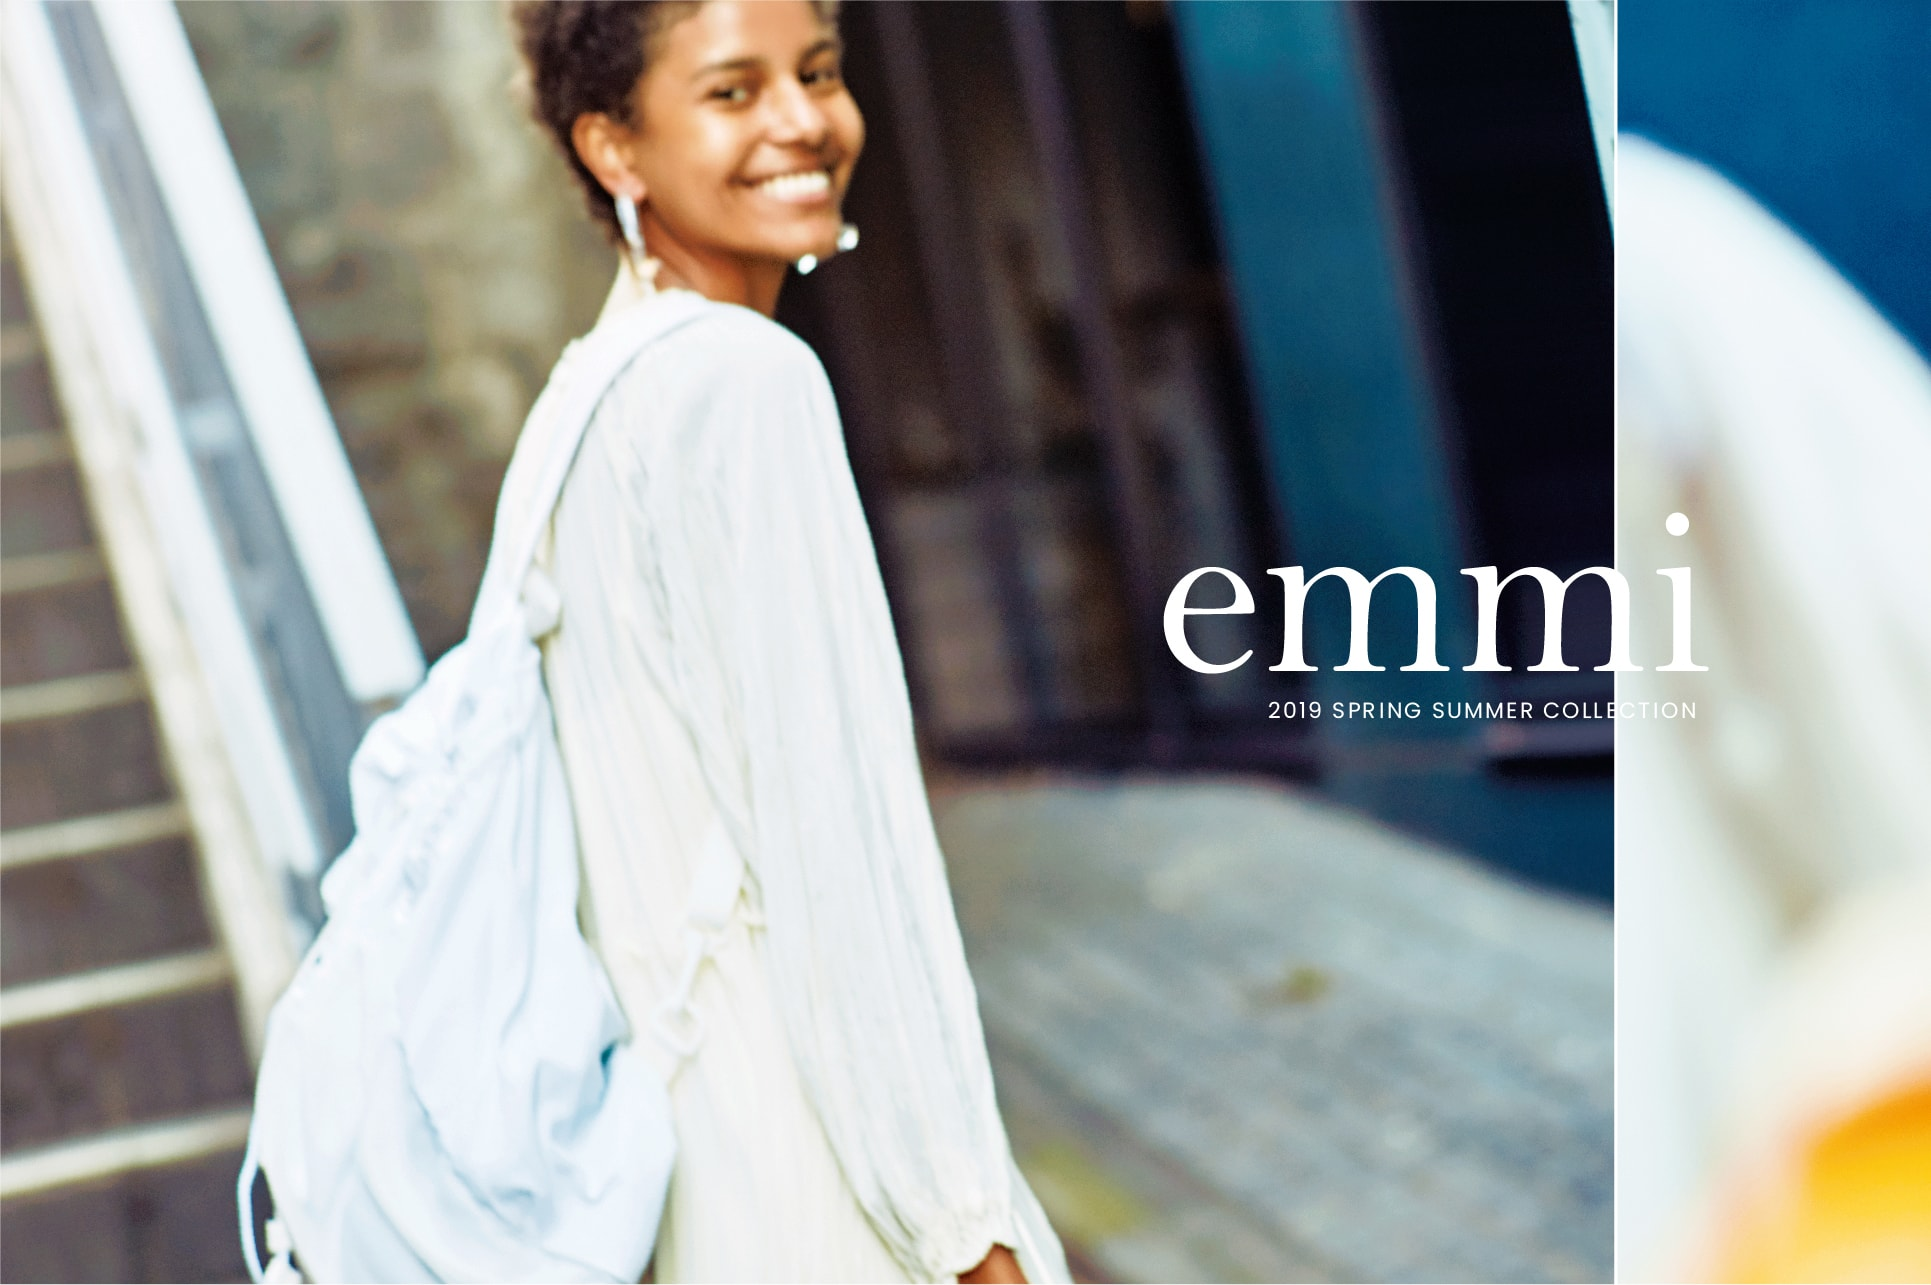 emmi 2019 SPRING SUMMER COLLECTION